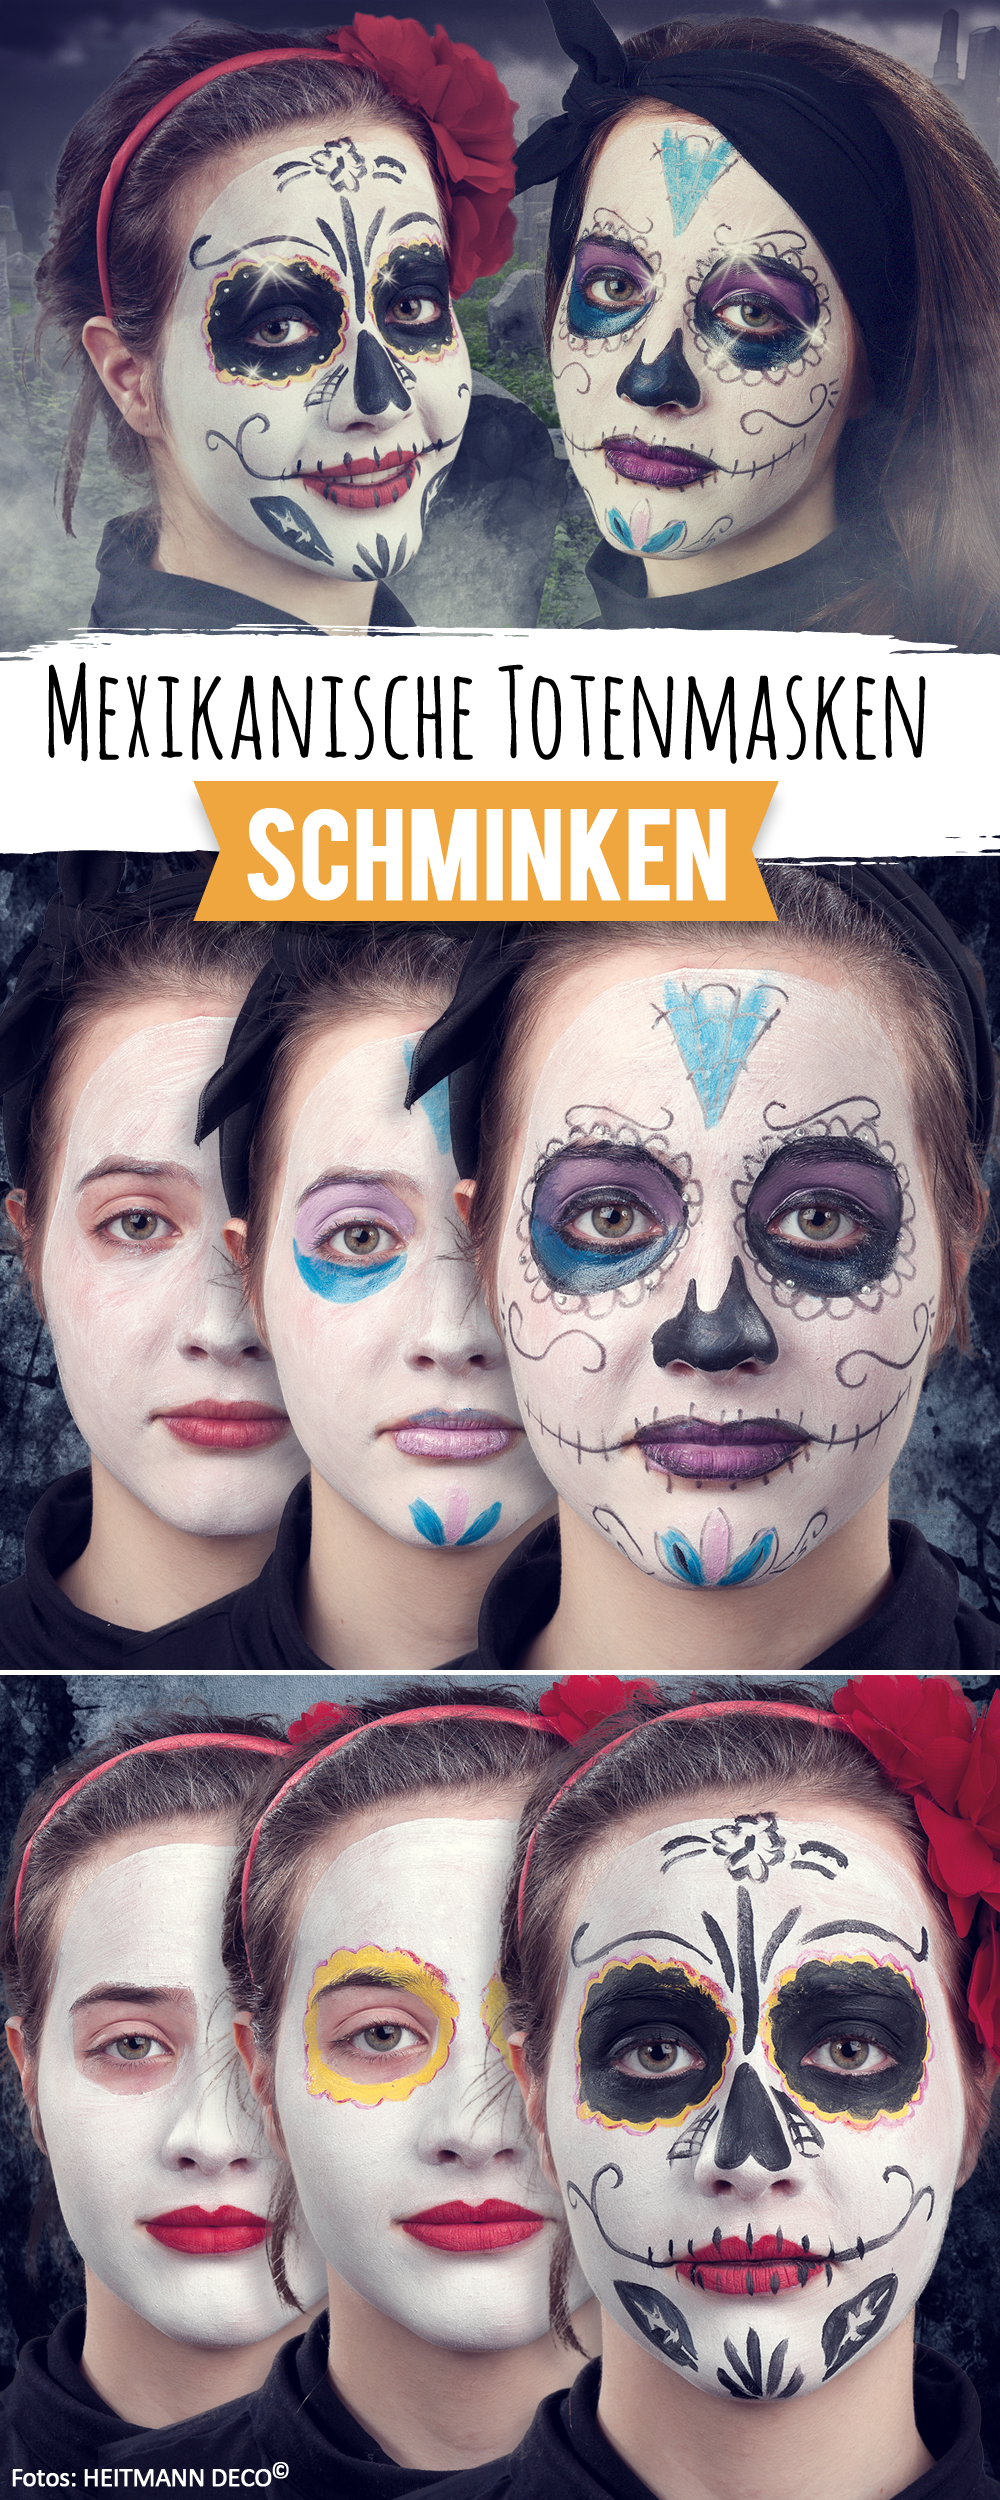 Perfekt f r halloween mexikanische totenmaske schminken costumes pinterest - Mexikanische totenmaske schminken ...